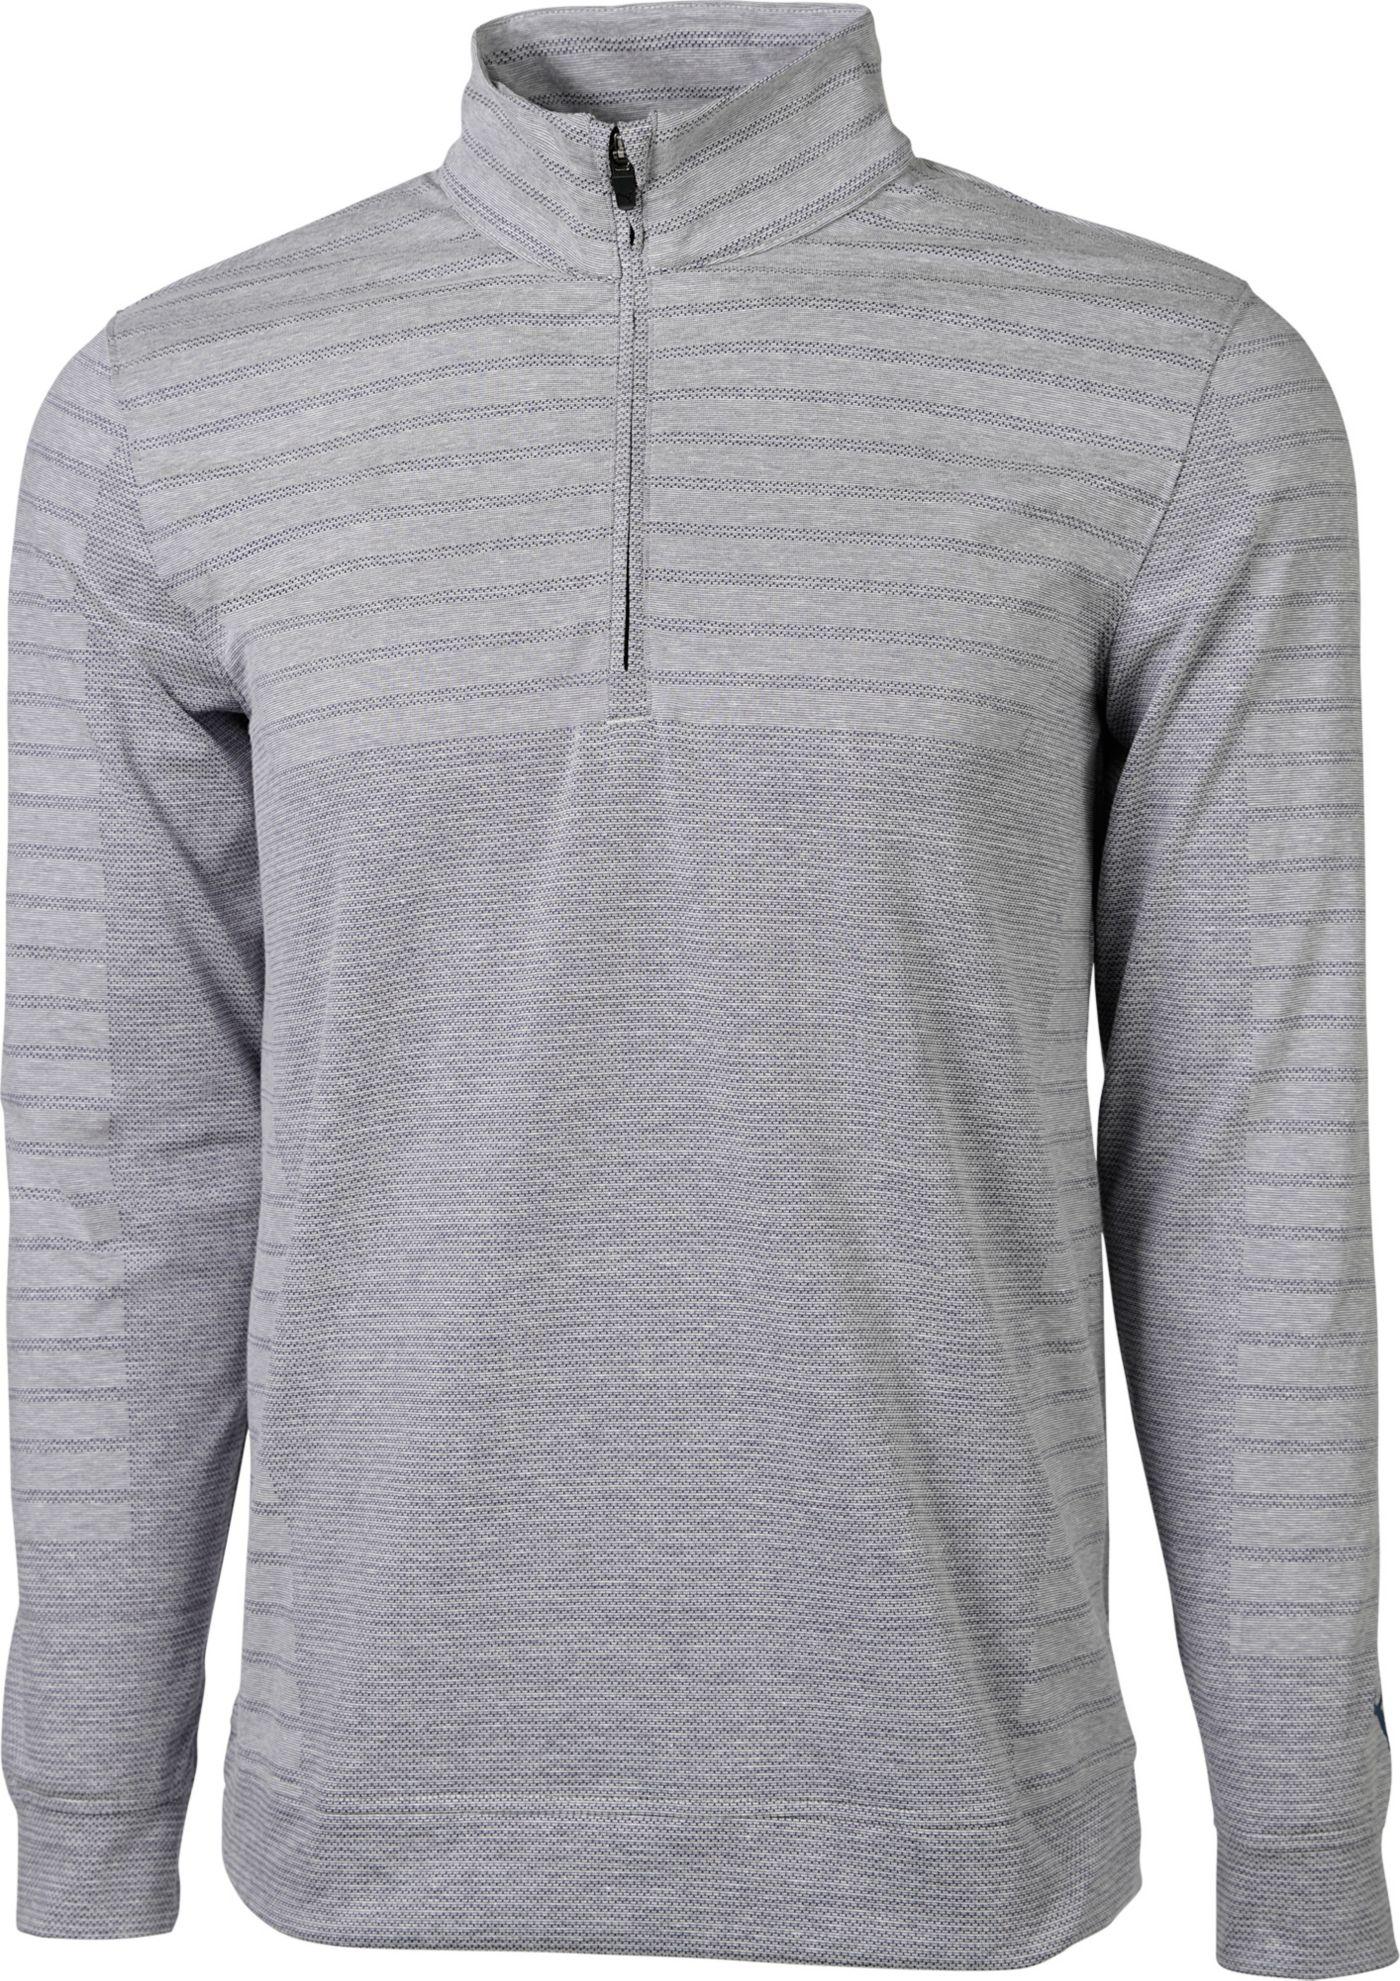 PUMA Men's Mapped ¼ Zip Golf Pullover